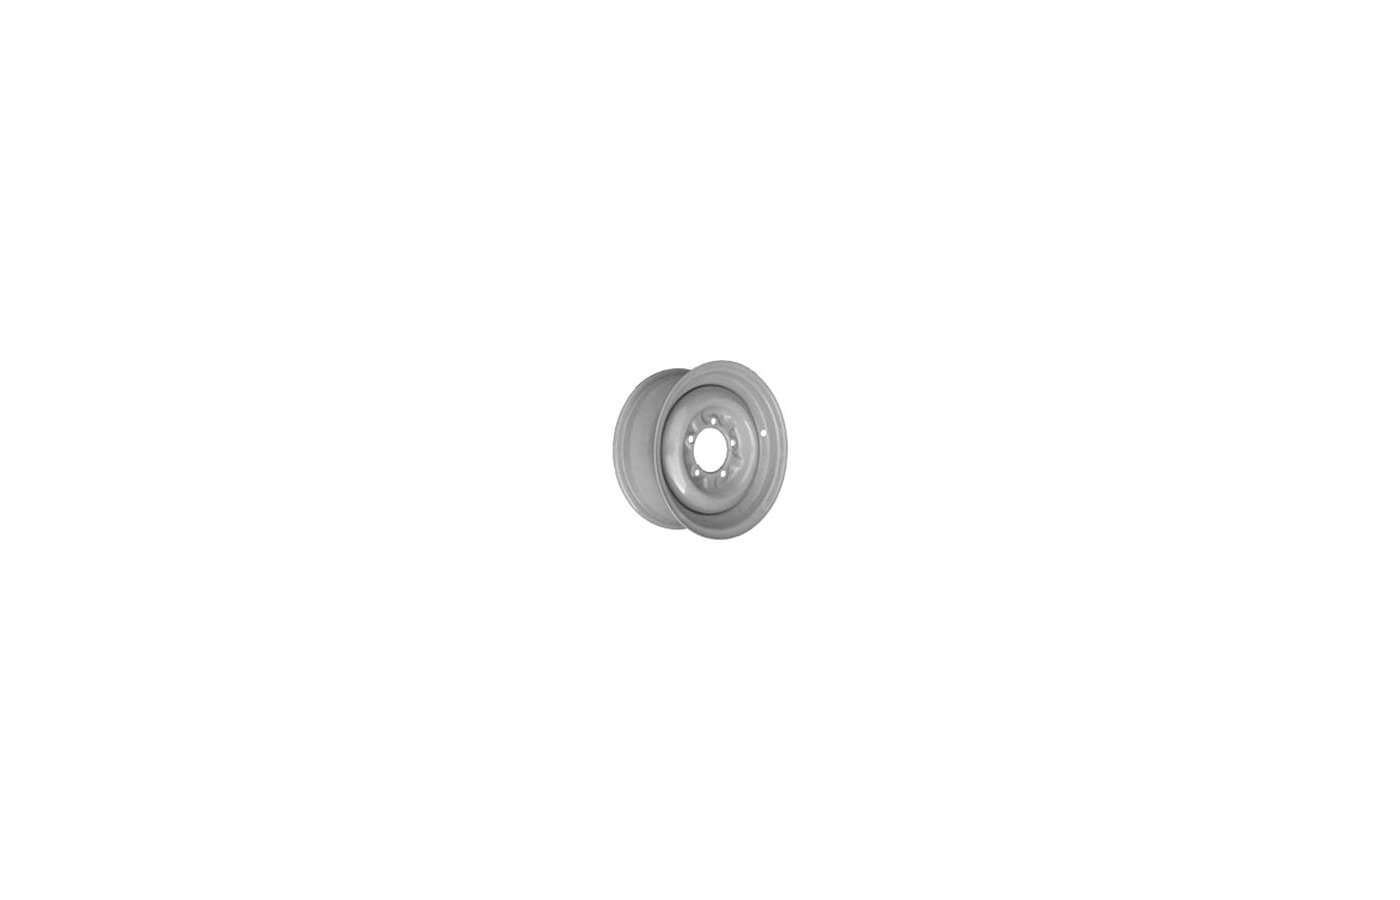 Диск ГАЗ УАЗ-450 6x15/5x139.7 D108 ET22